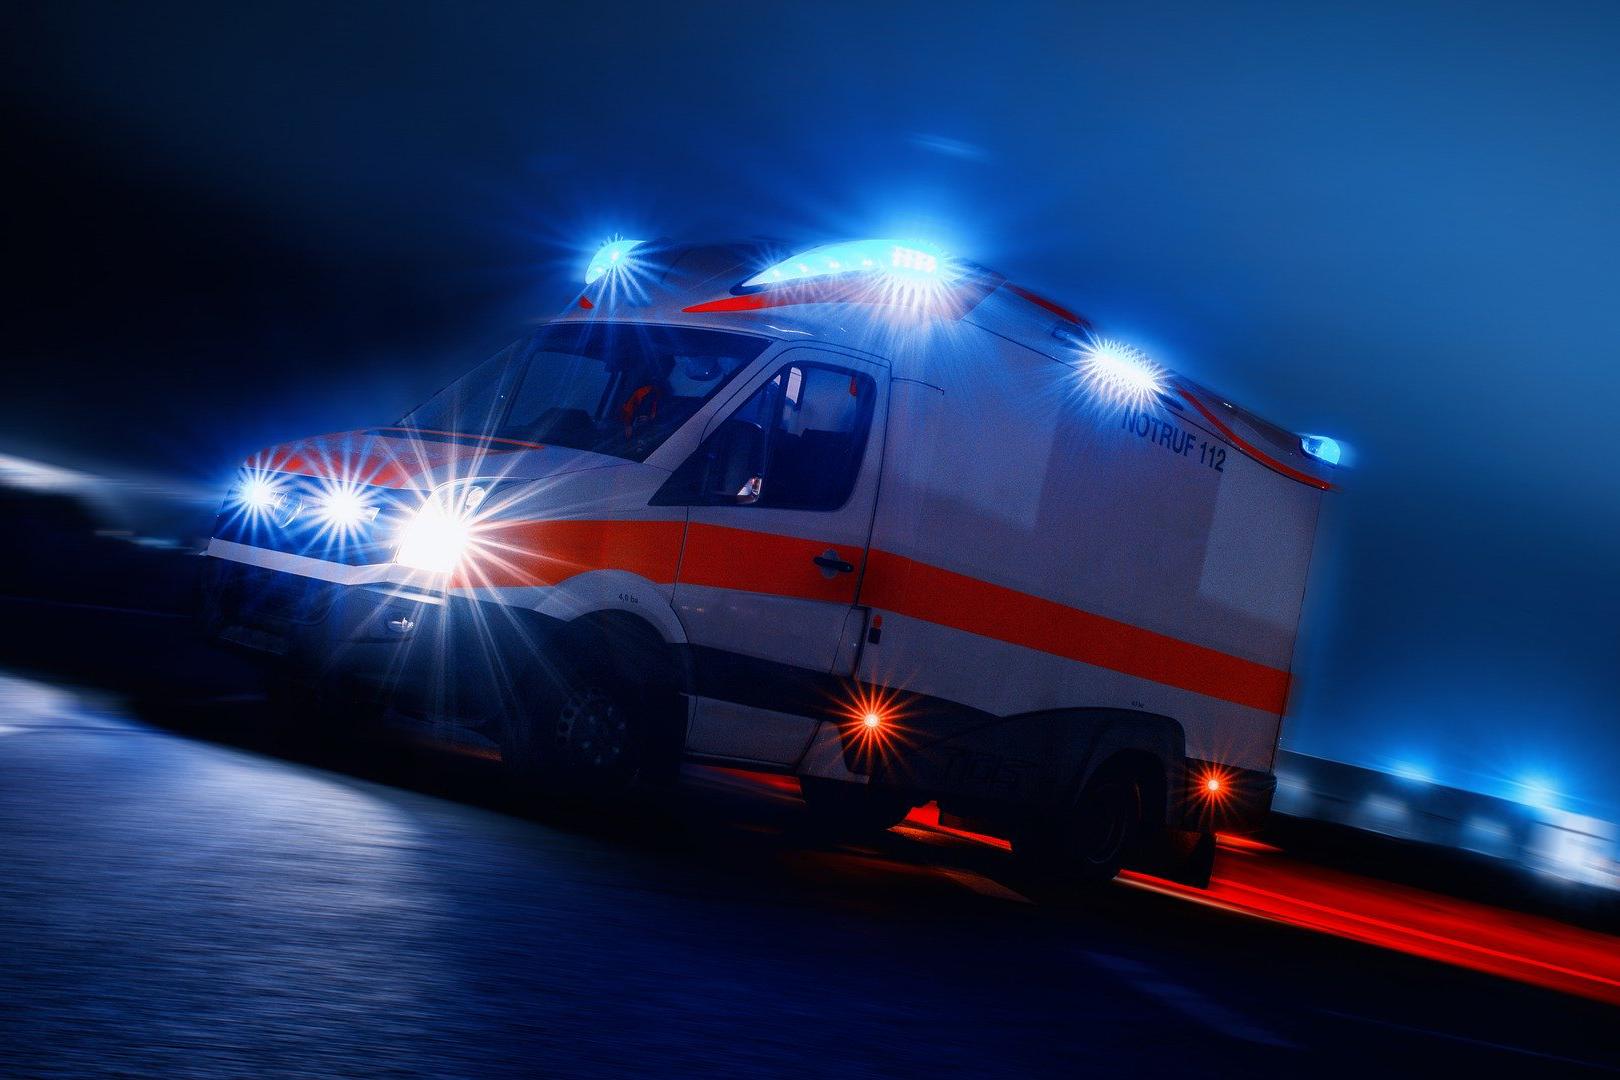 17-jähriger Isselburger bei Unfall in Bocholt leicht verletzt